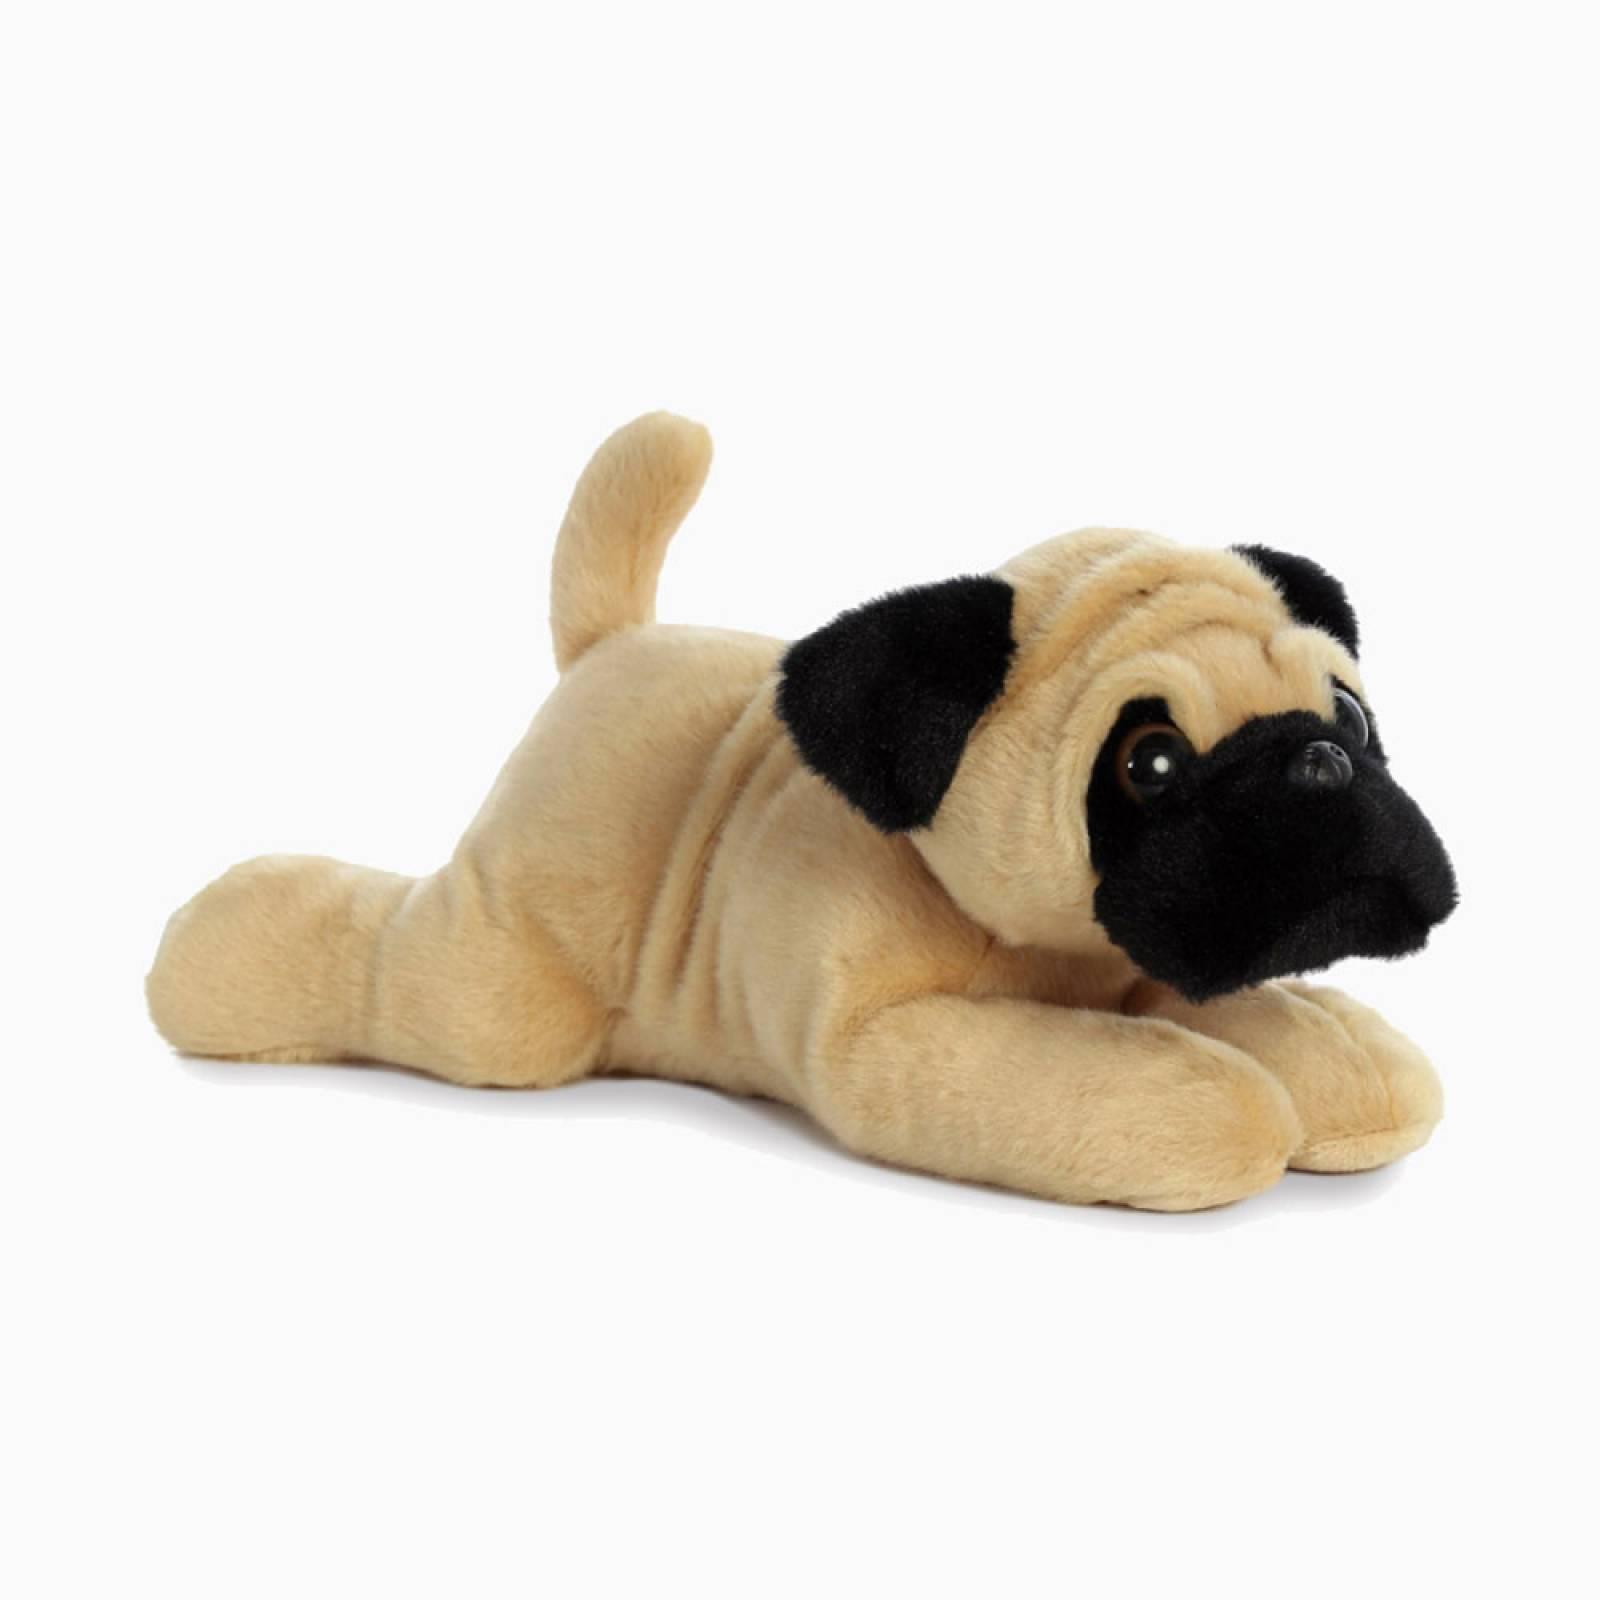 Pug Dog Flopsies Soft Toy 0+